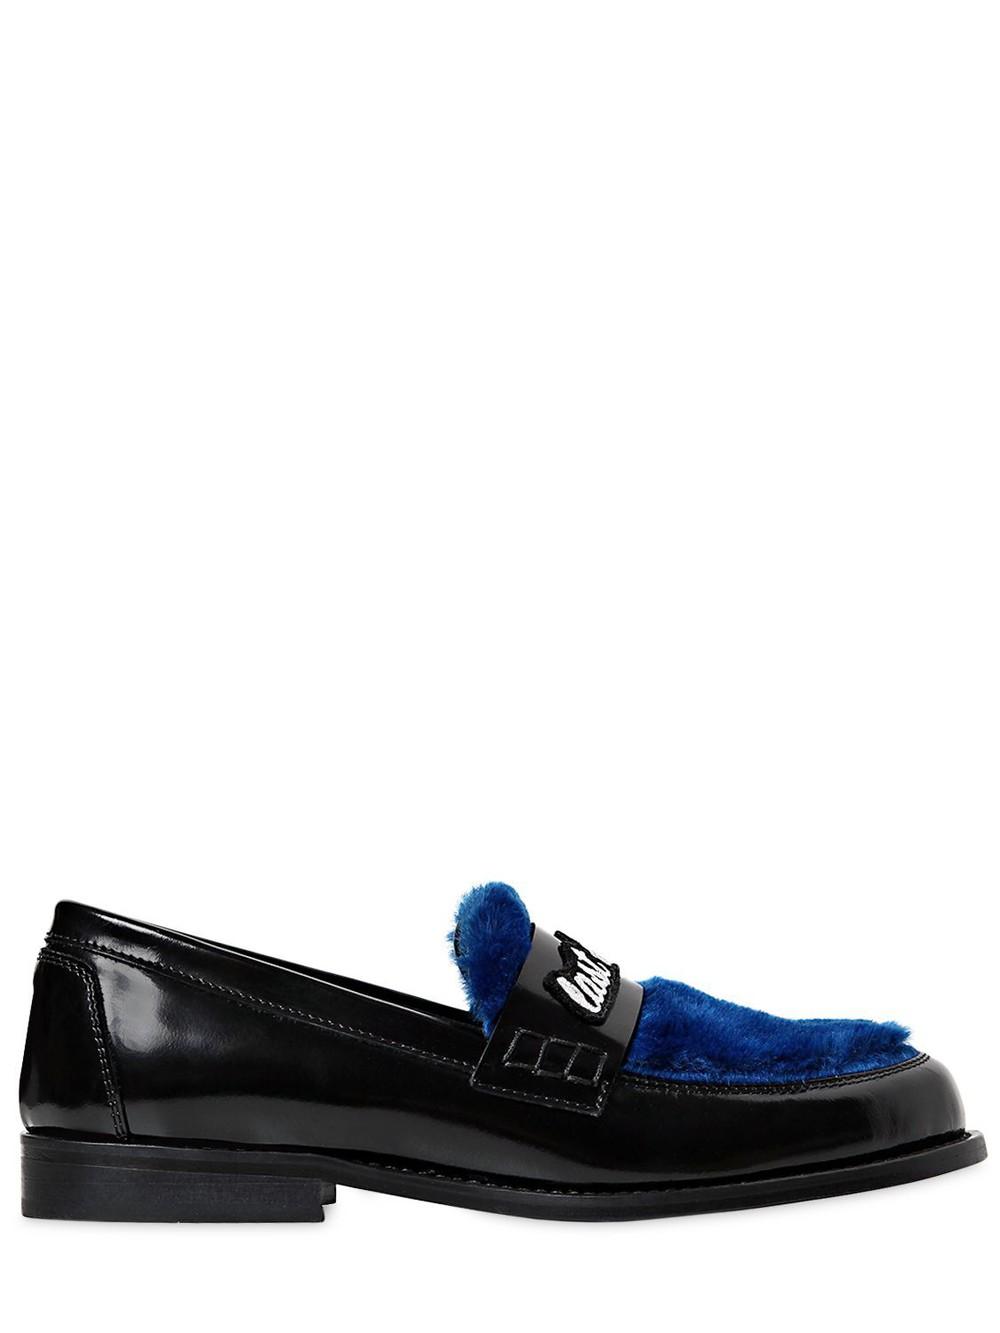 JOSHUA SANDERS 20mm Last Dance Leather Loafers in black / blue